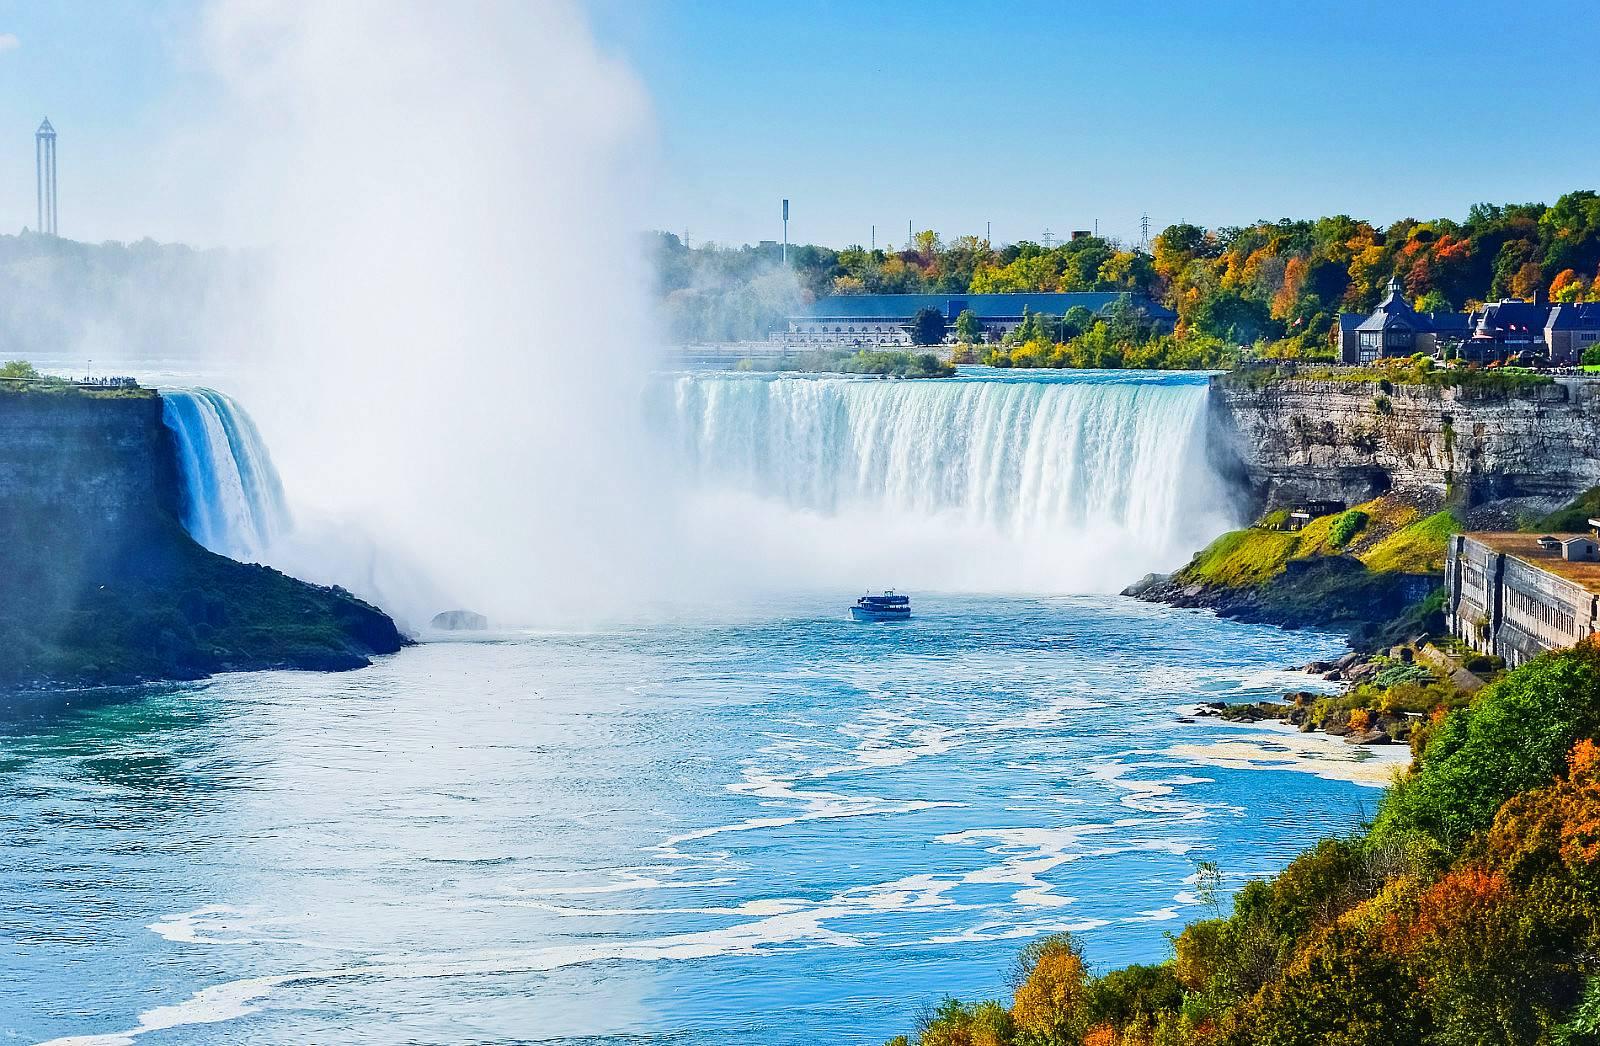 7-Day Canada Tour From Toronto: Thousand Islands - Montreal - Quebec - Ottawa - Niagara Falls